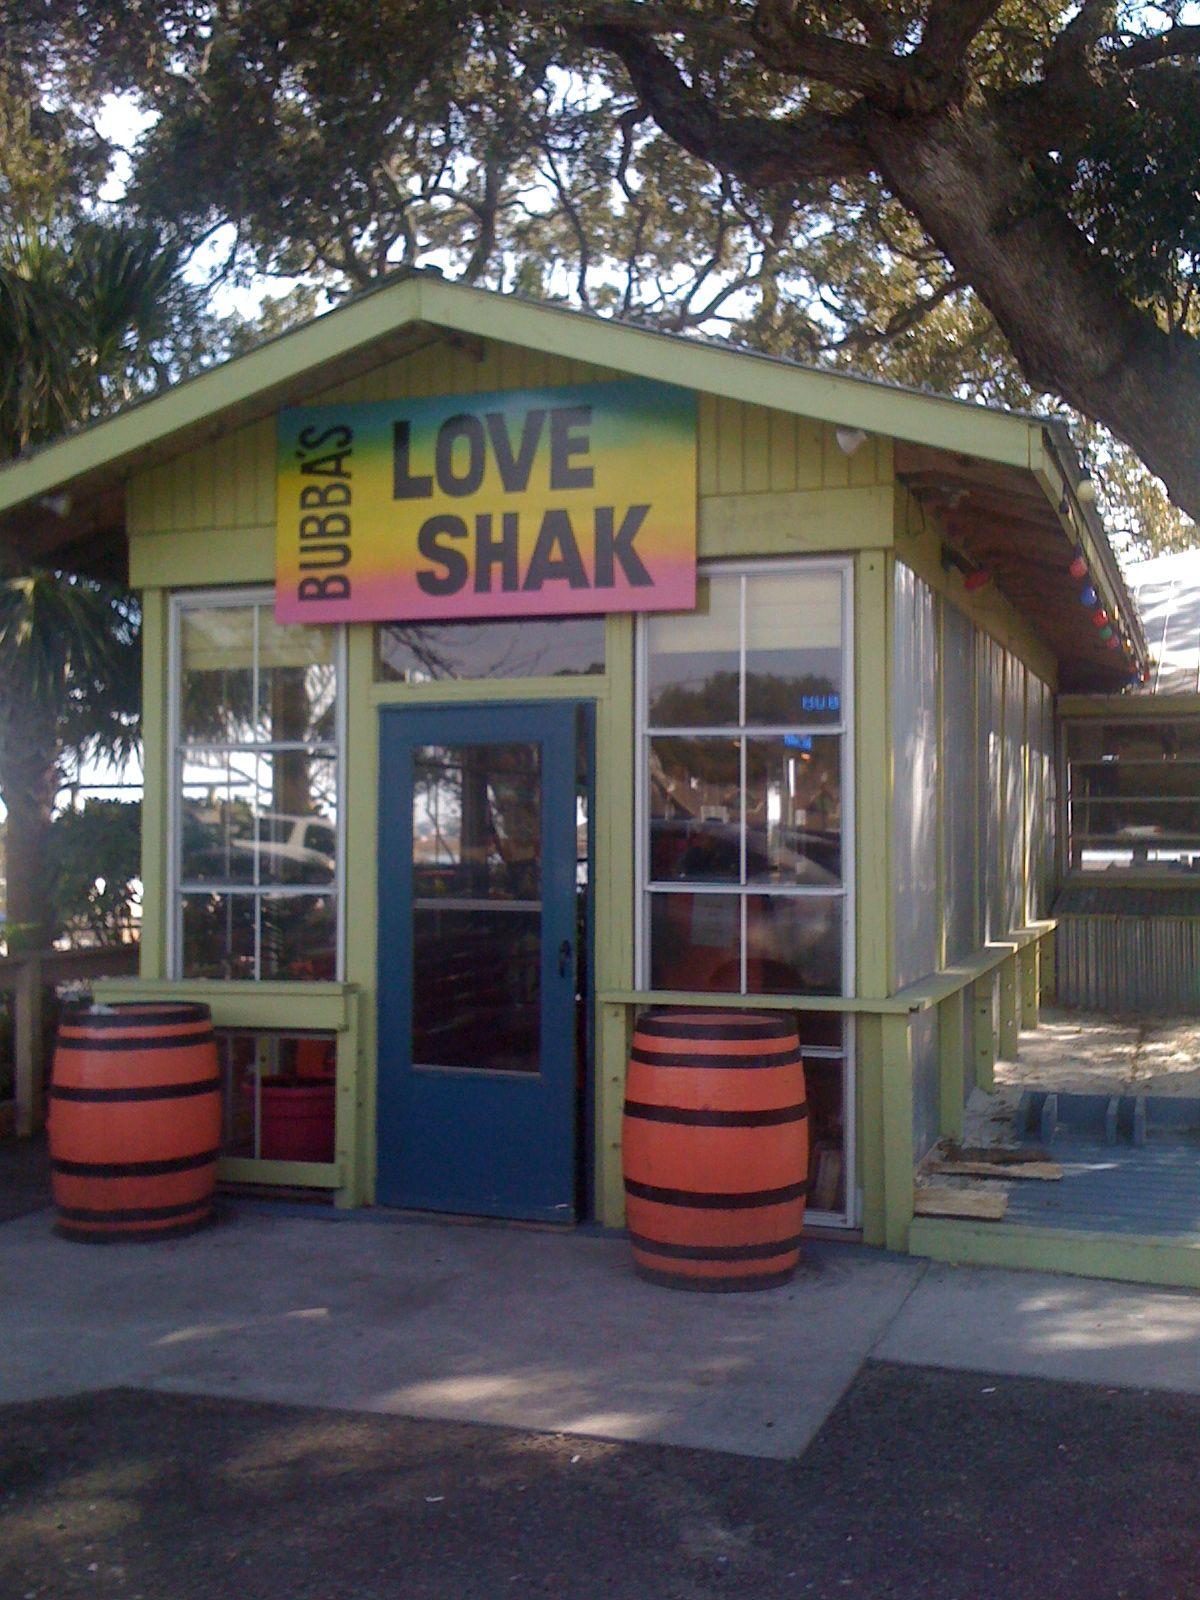 Restaurant Rave Bubba S Love Shak Murrells Inlet Sc With